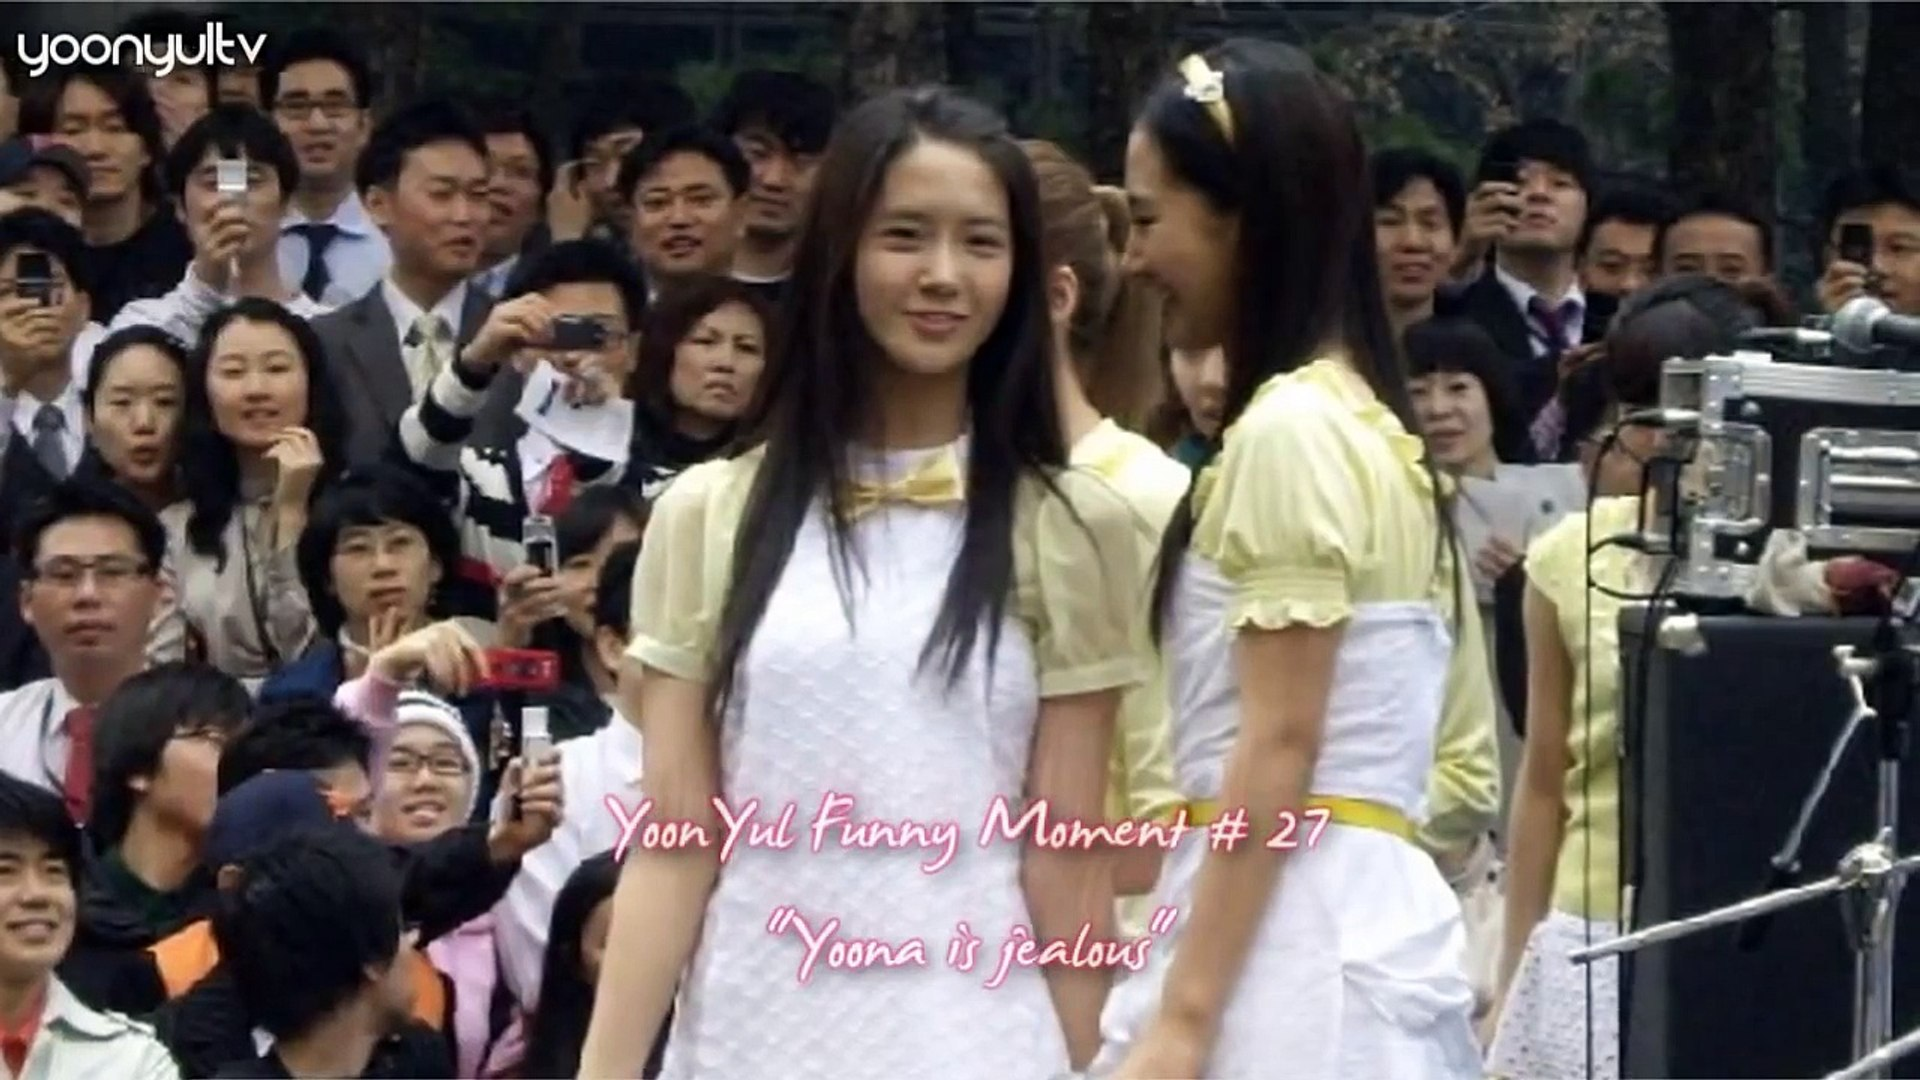 YoonYul 윤율 Funny Moment #27 -